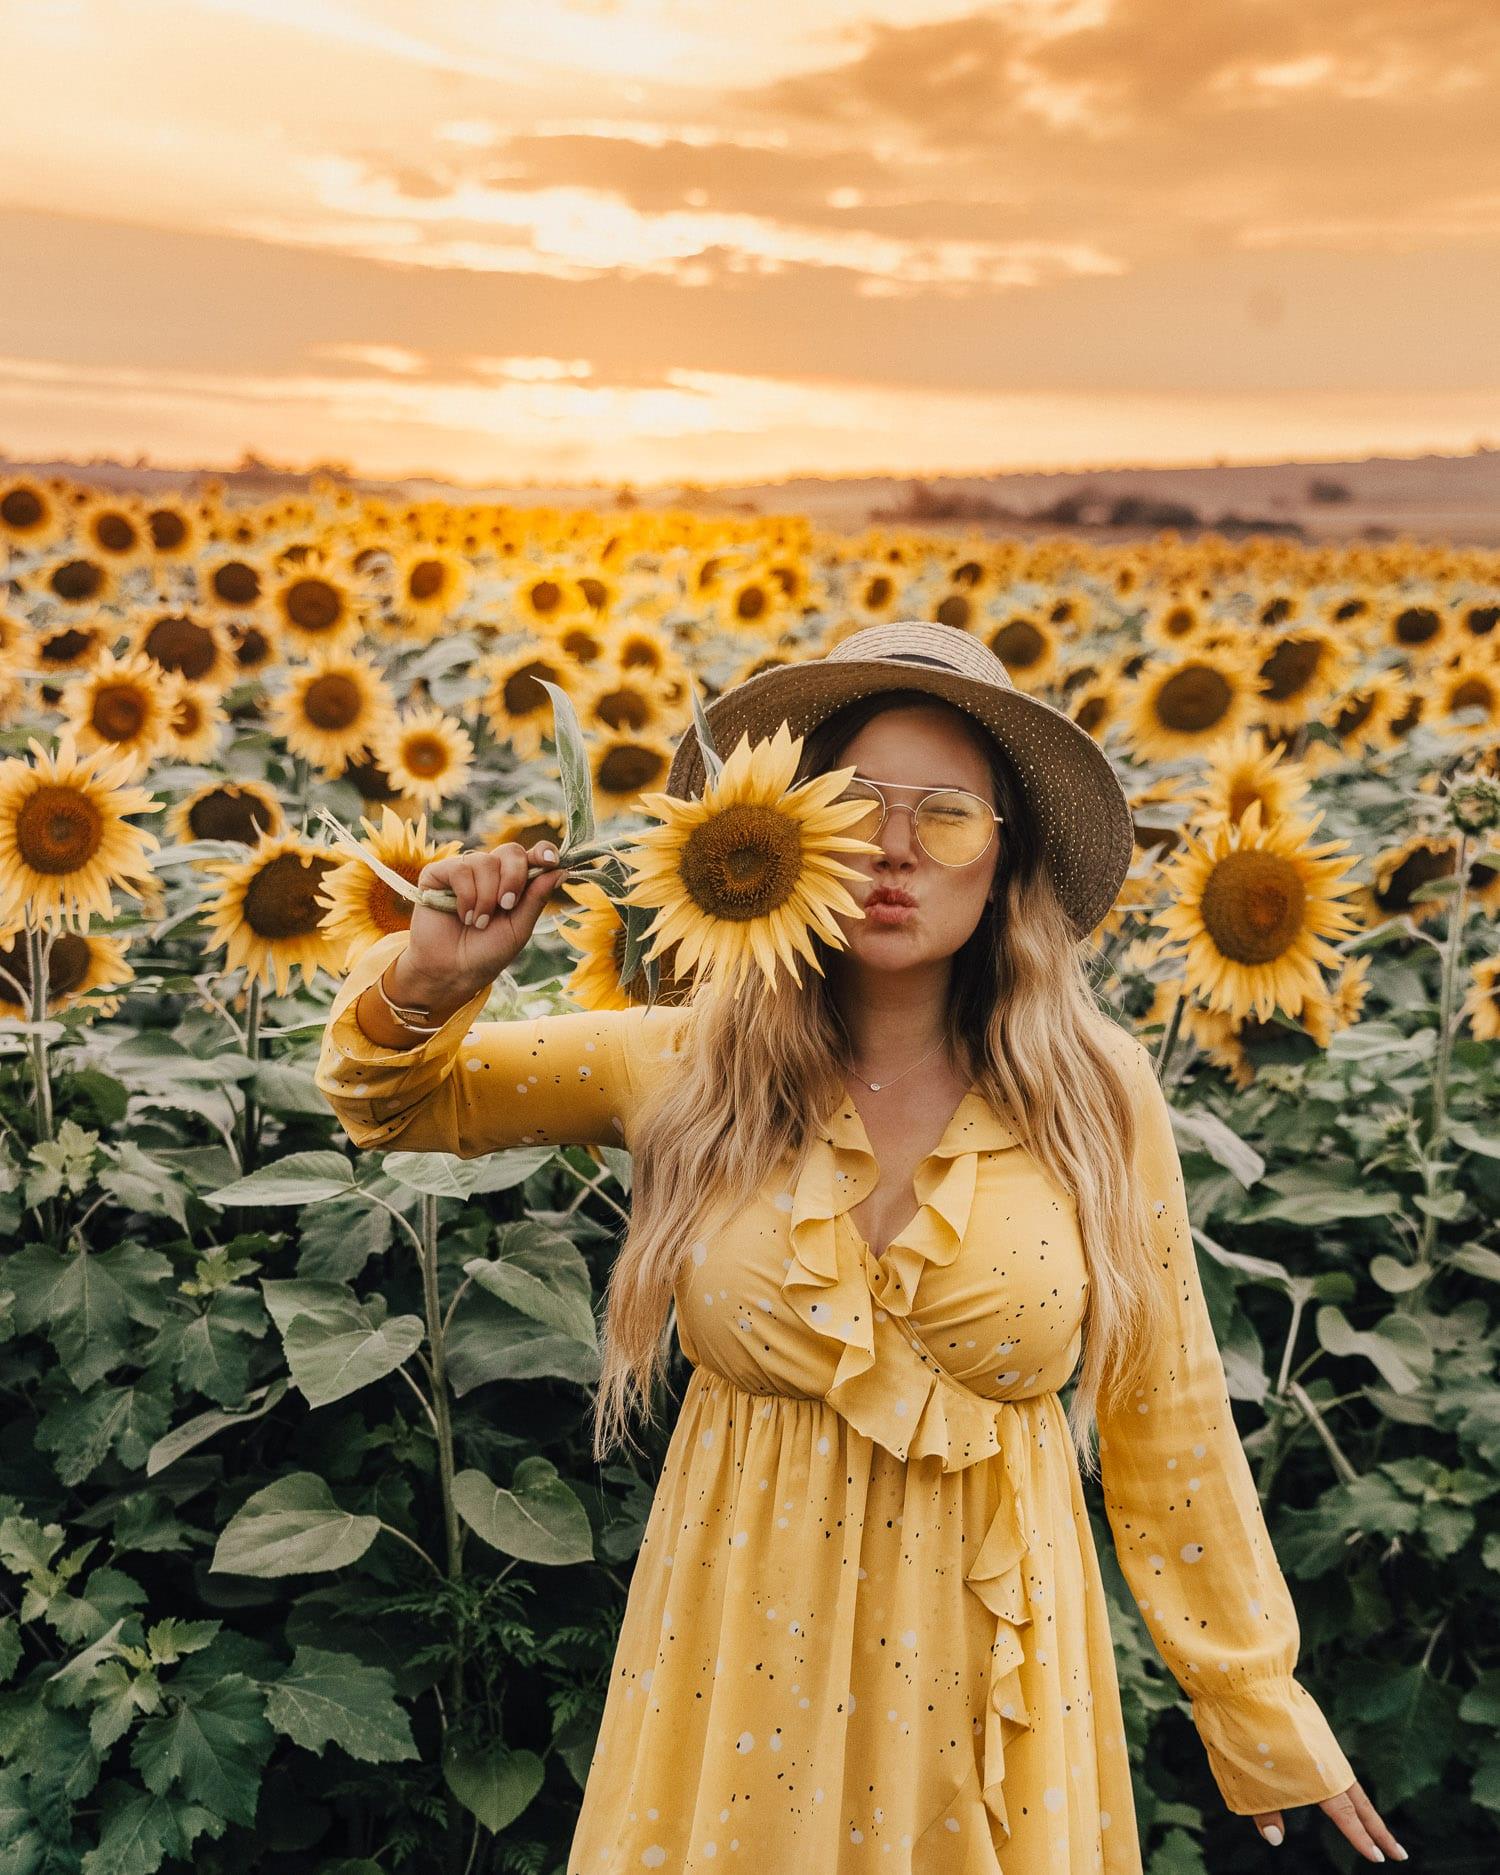 Sunflower field in Karanac | Things to Do in Slavonia, Croatia